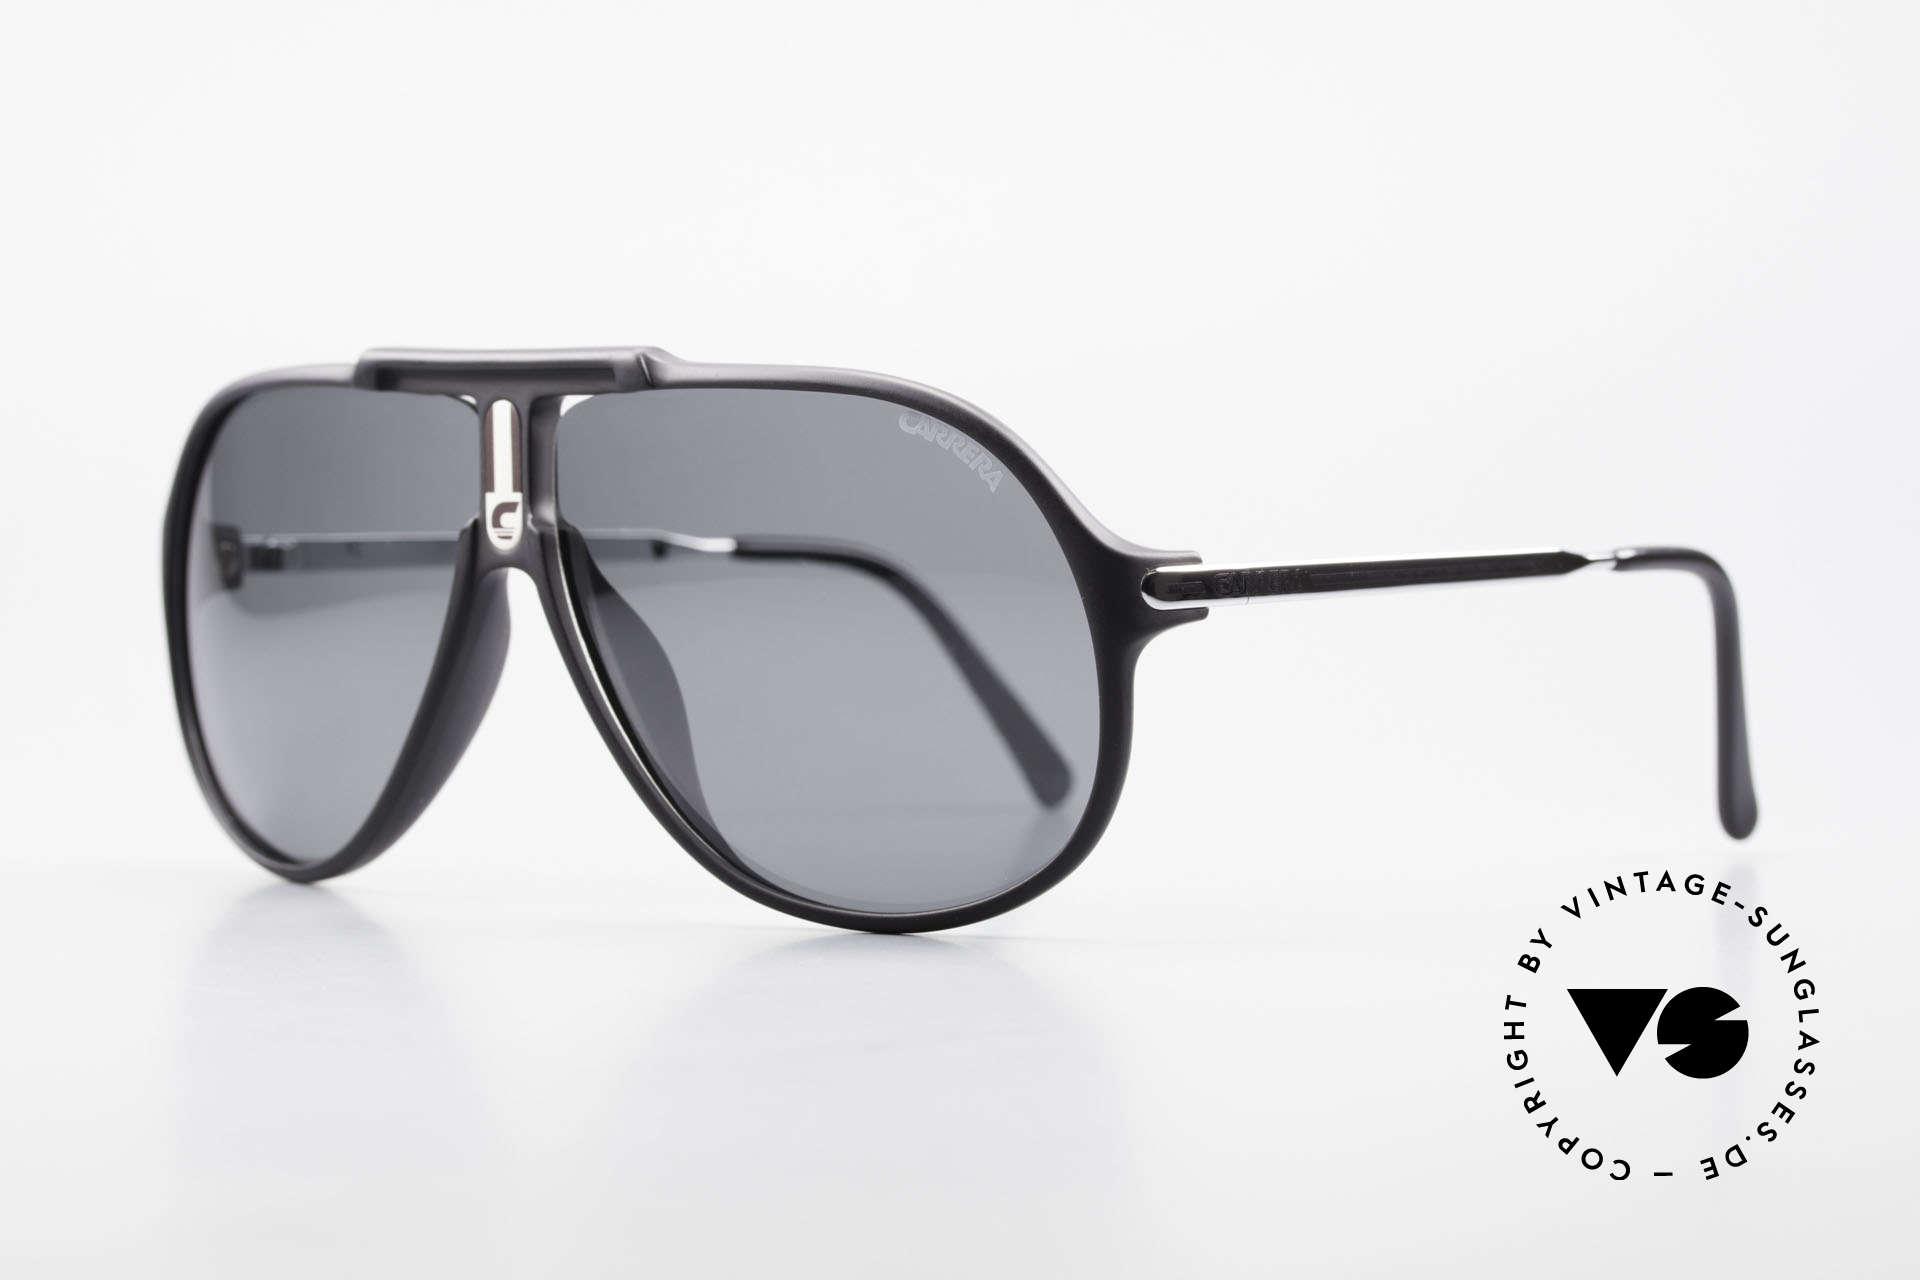 Carrera 5590 80er 90er Brille Polarisierend, orig. Katalog-Name: Modell 5590 Jet Sport Performance, Passend für Herren